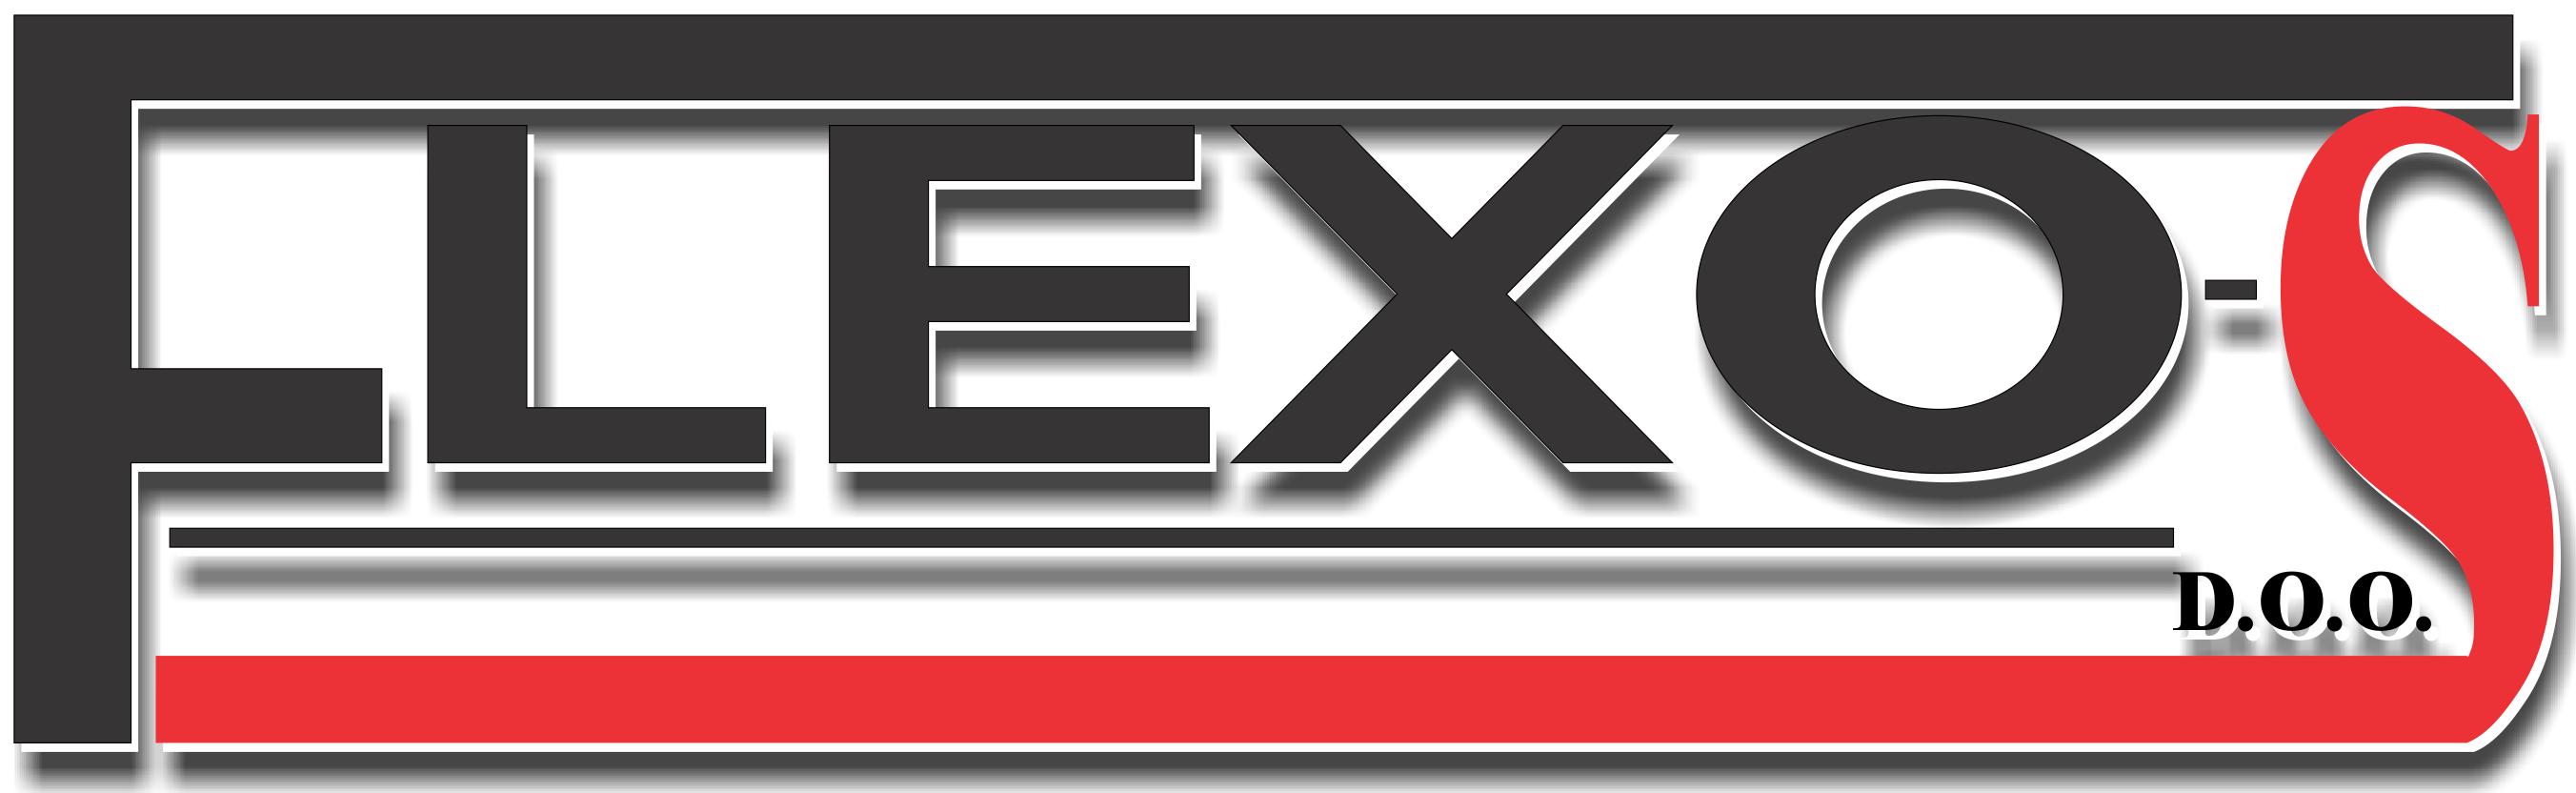 FLEXO-S d.o.o. ( ponuda selotejp traka, krep traka  , PP/PET , HDPE folija , papir u rolnama )